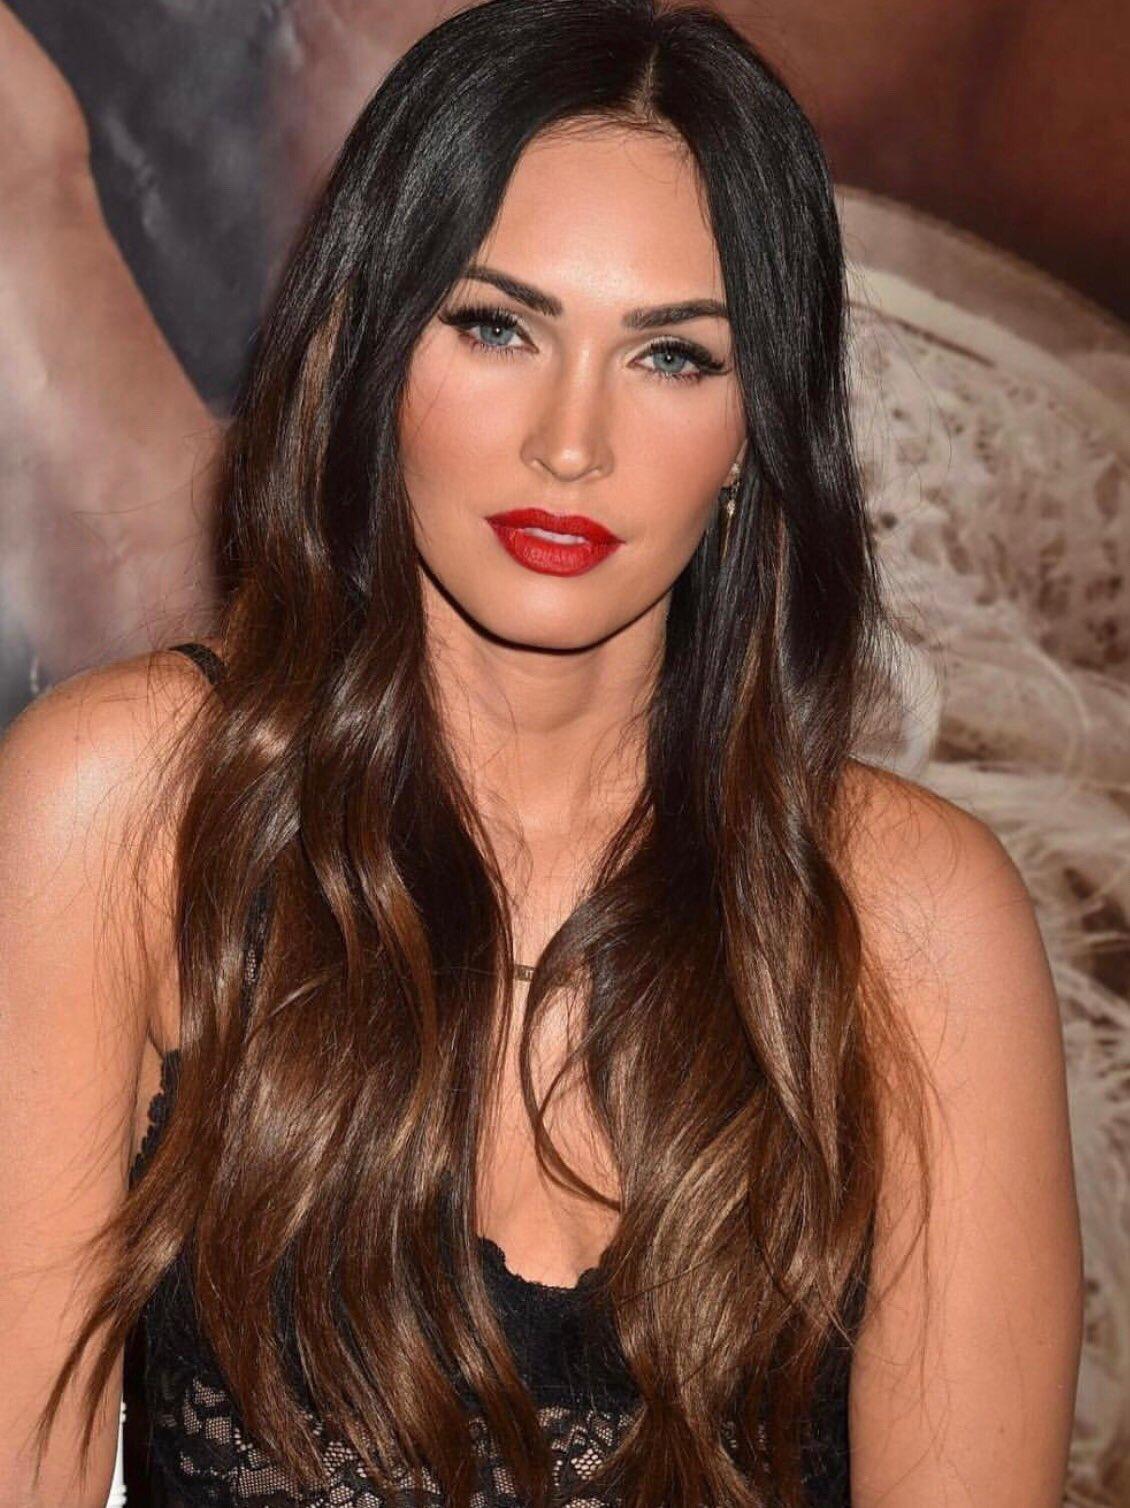 Happy birthday to this Queen, Megan Fox. My inspiration & main reason I love dark hair lol